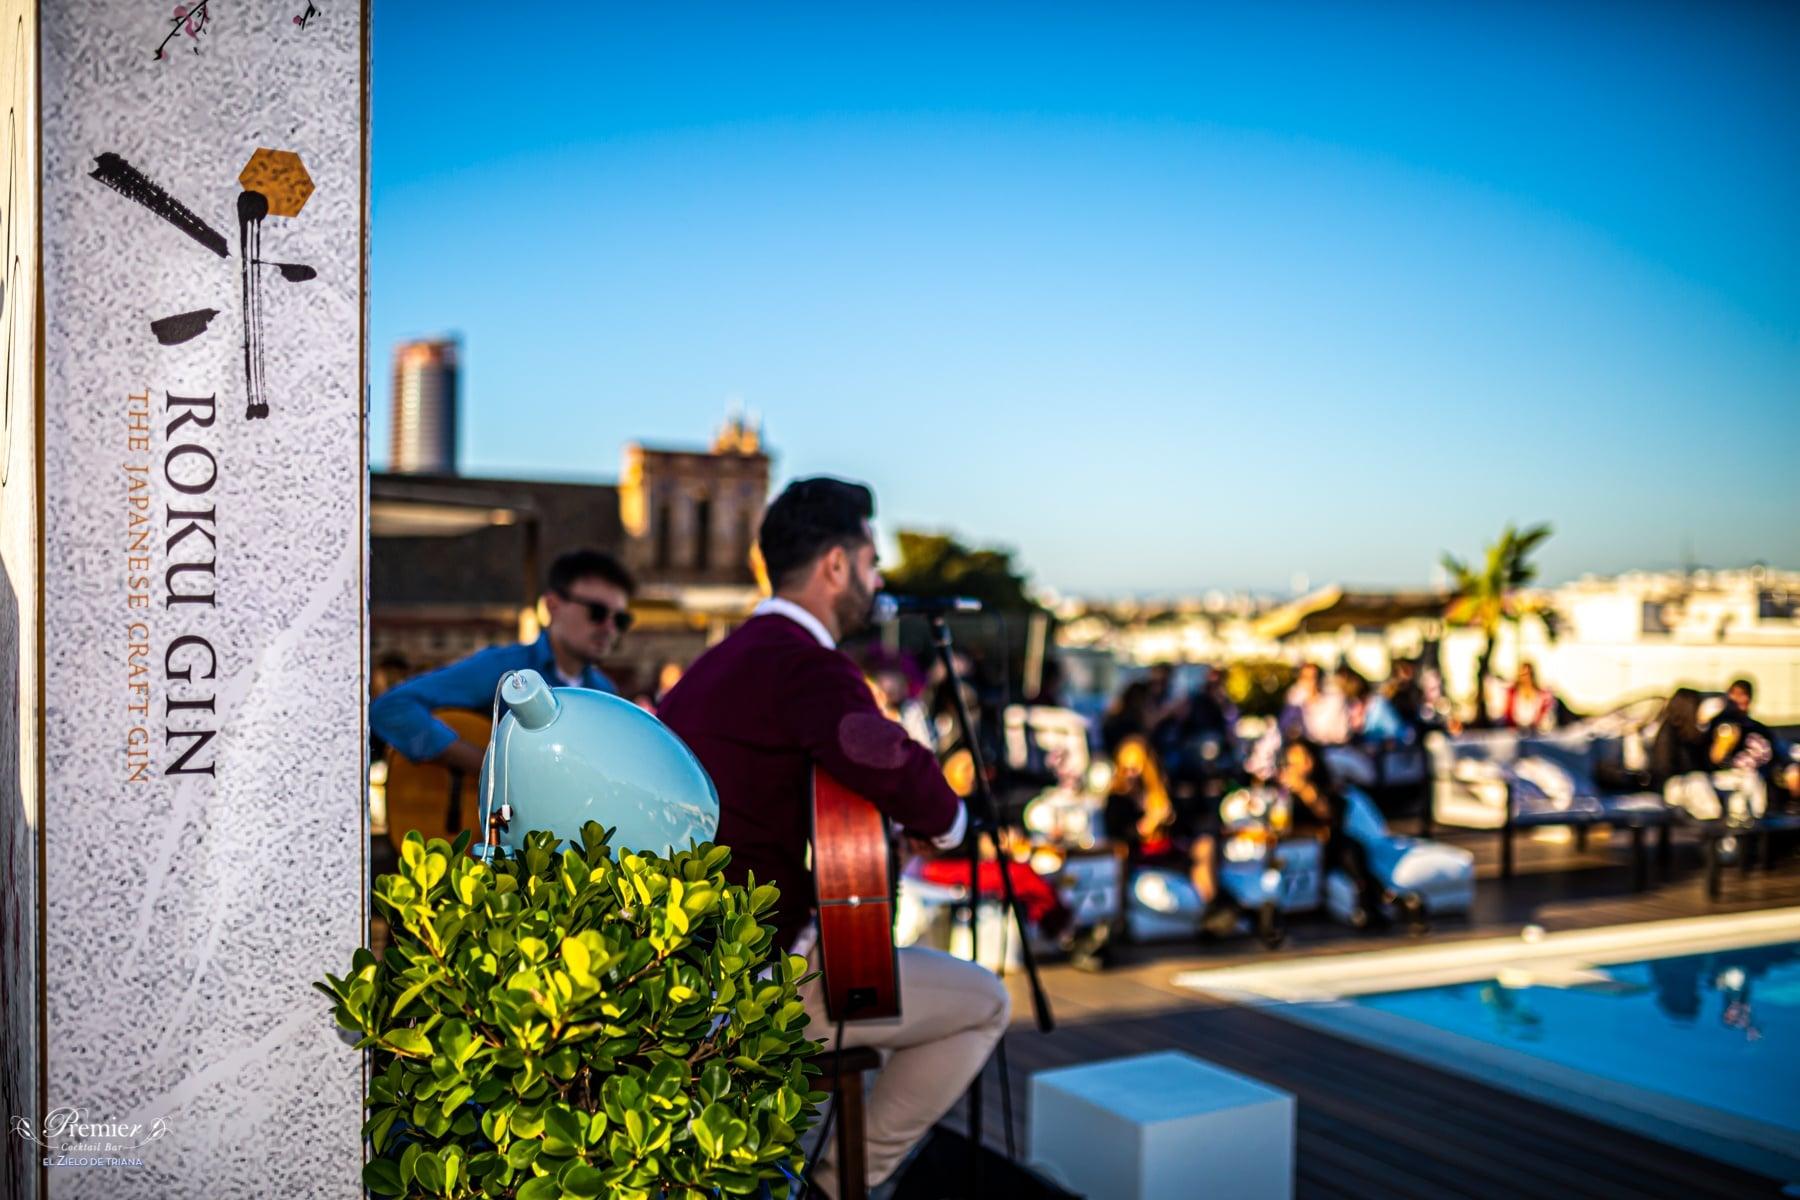 Terraza con música en directo en Sevilla